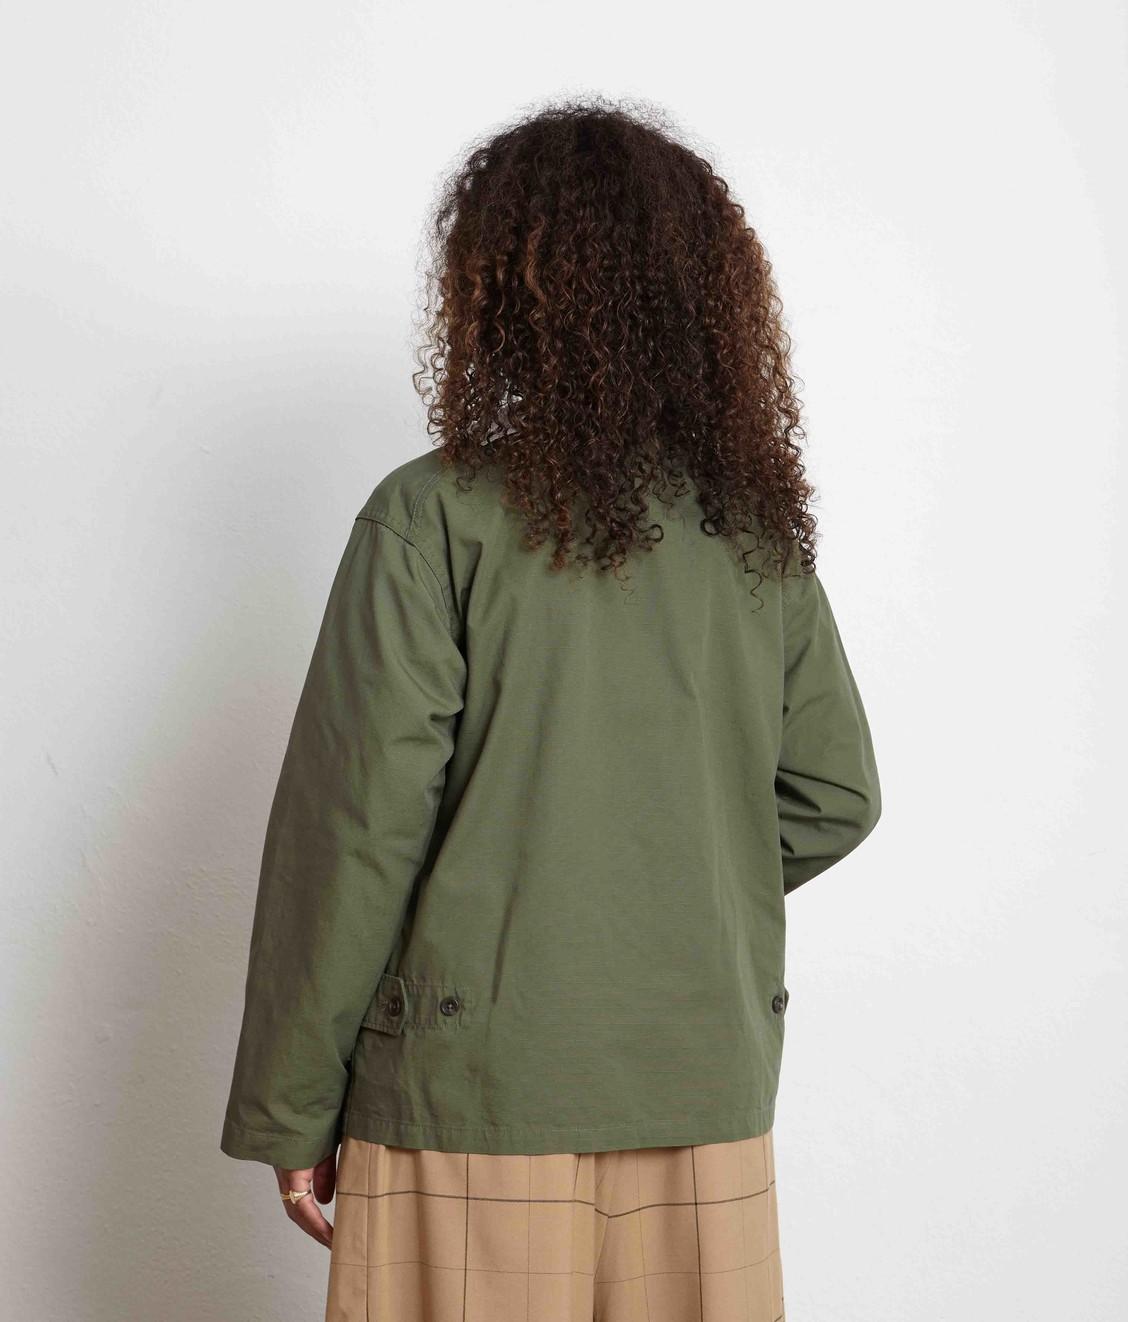 Engineered Garments EG Cardigan Jacket Olive Cotton Ripstop